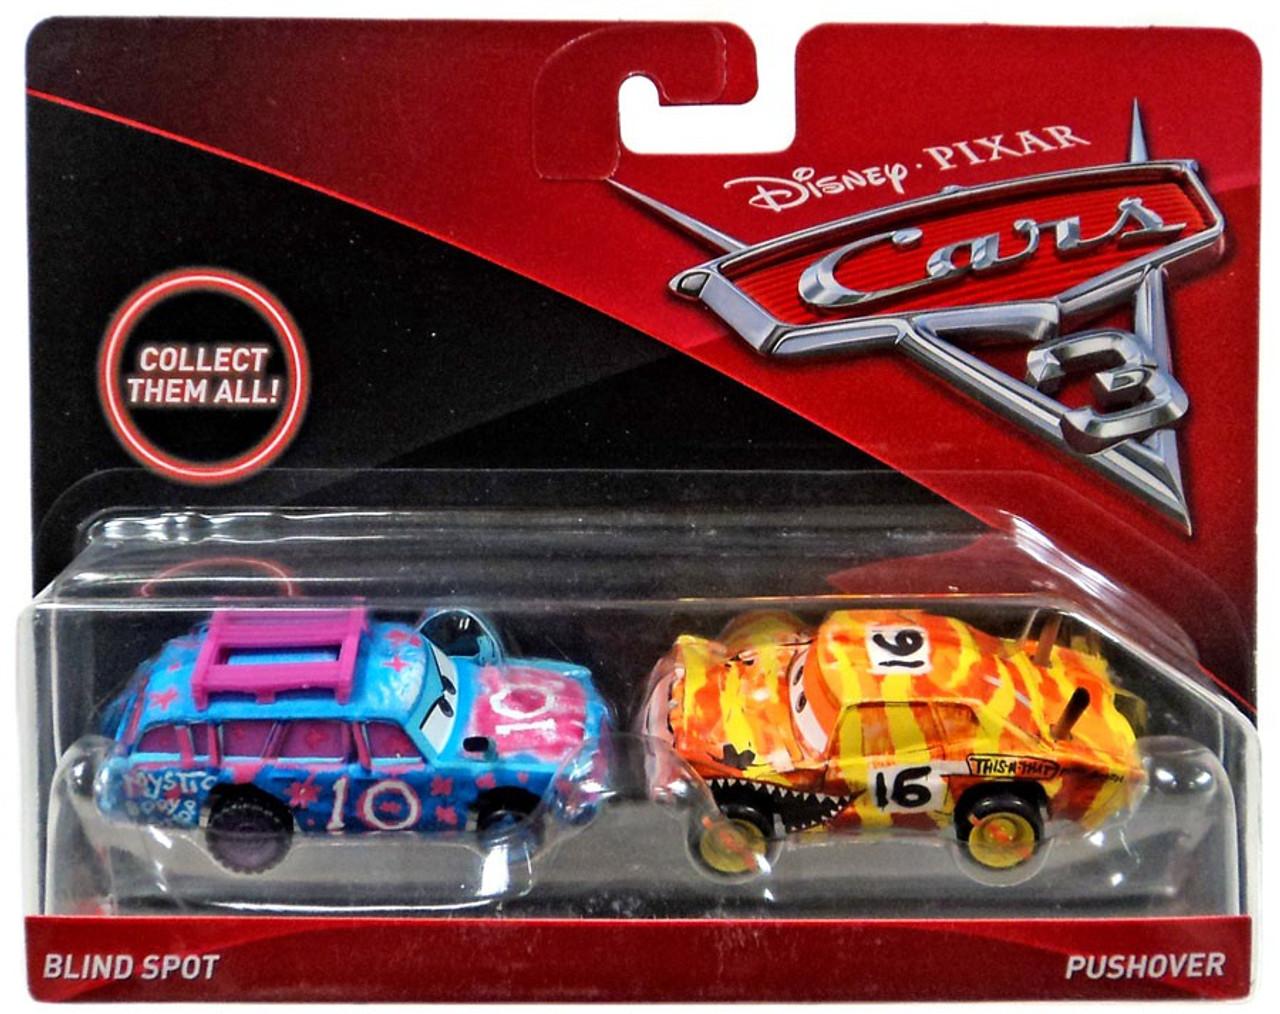 Disney Pixar Cars Cars 3 Blind Spot Pushover 155 Diecast 2 Pack